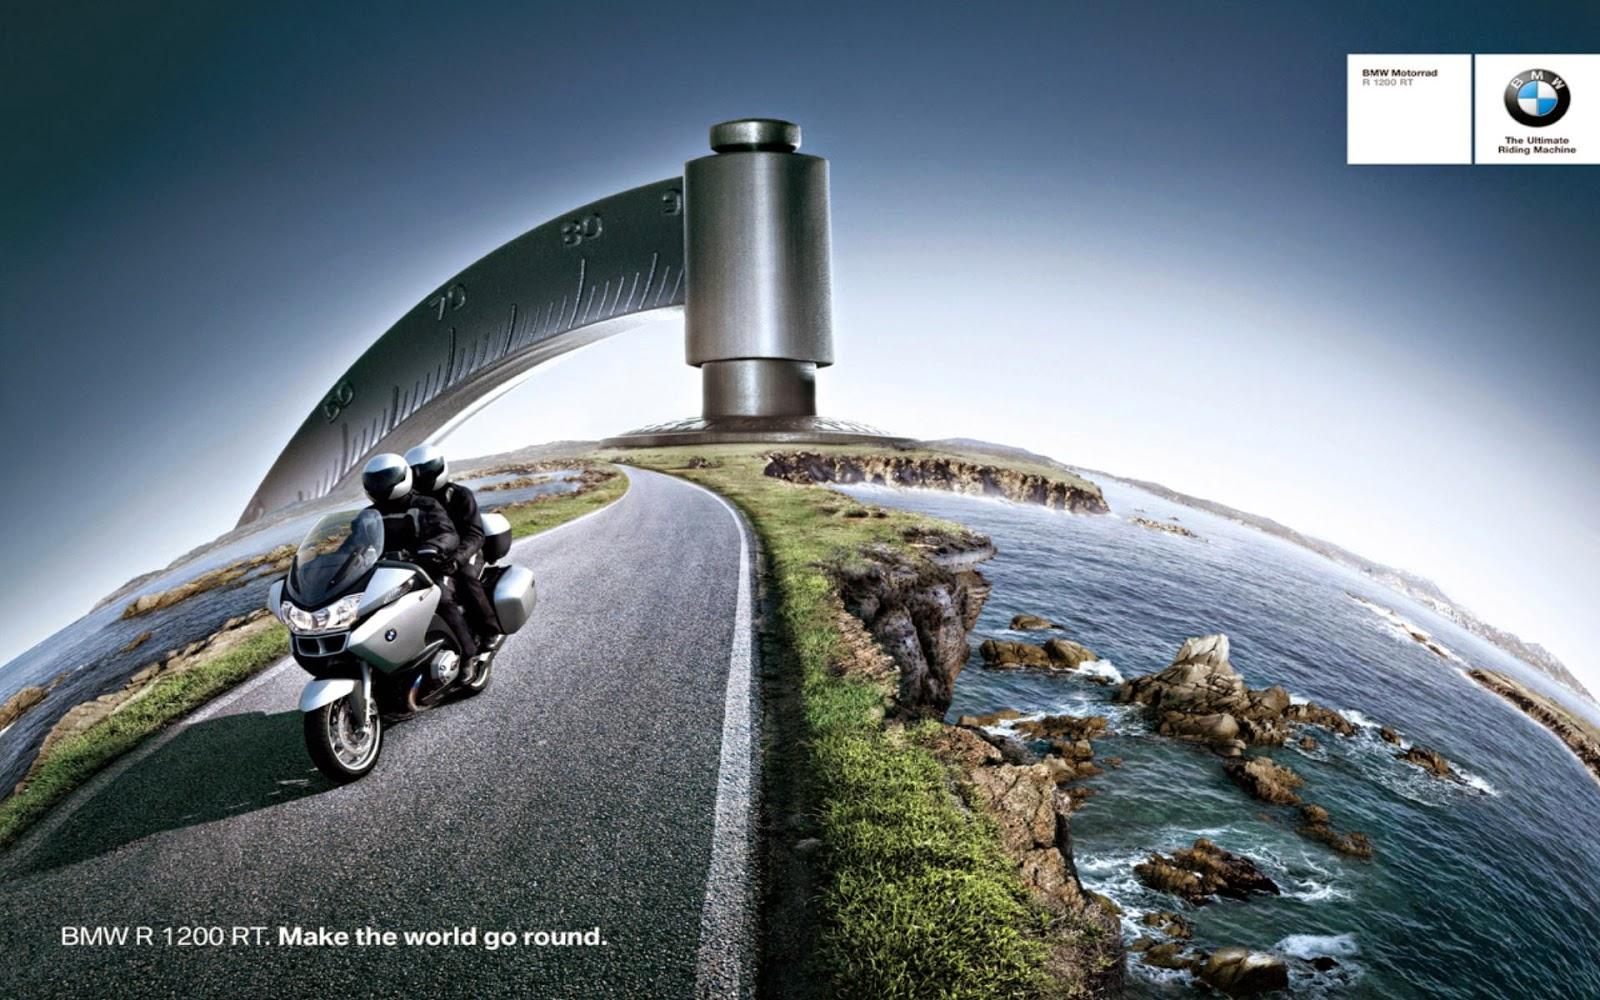 photo wallpaper creative advertising - photo #10